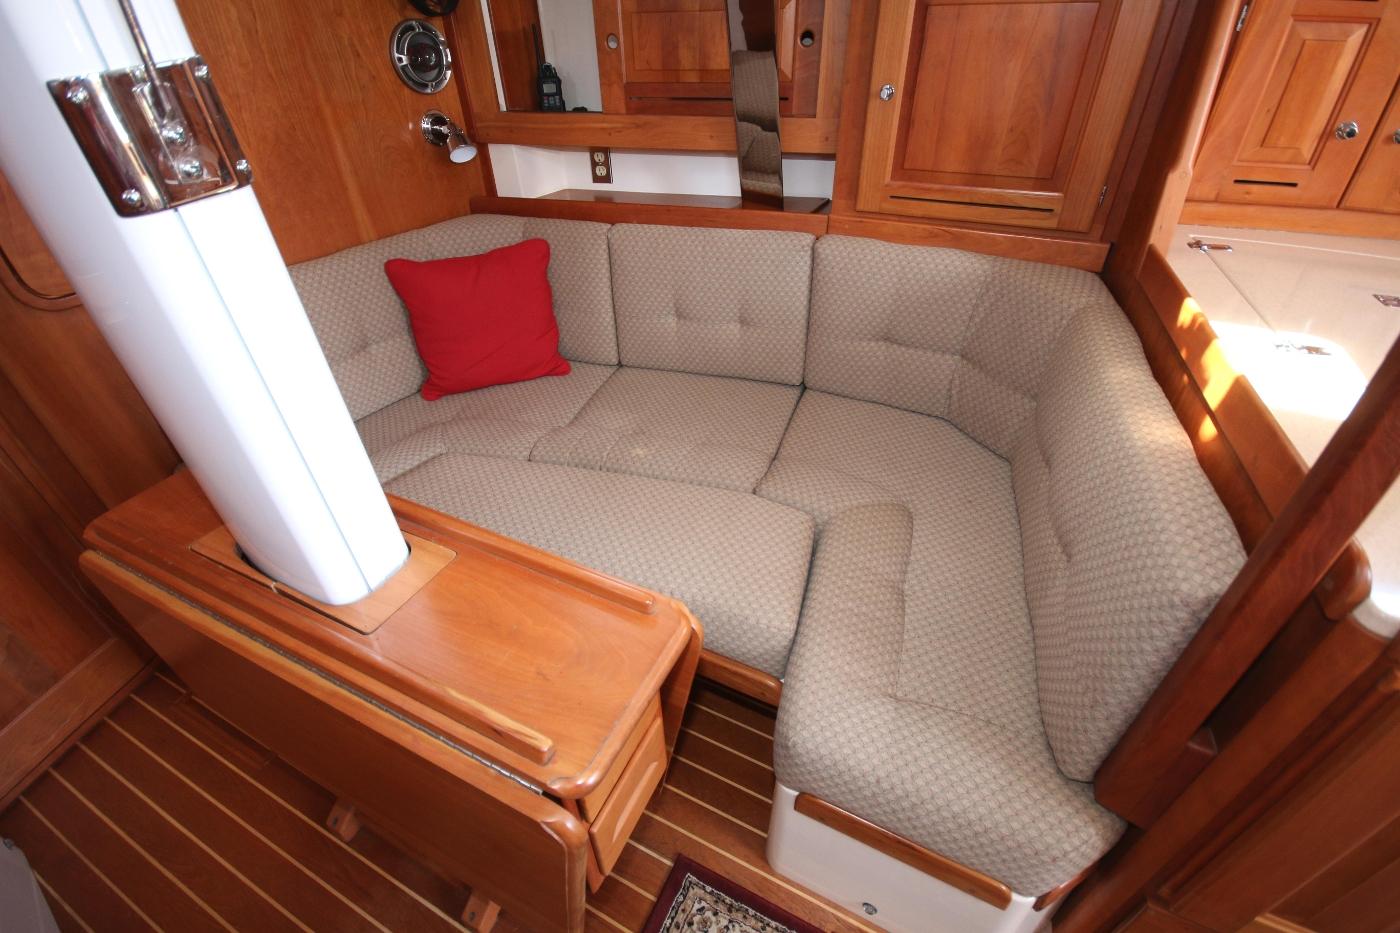 2003 Tartan 3700, Double berth in saloon